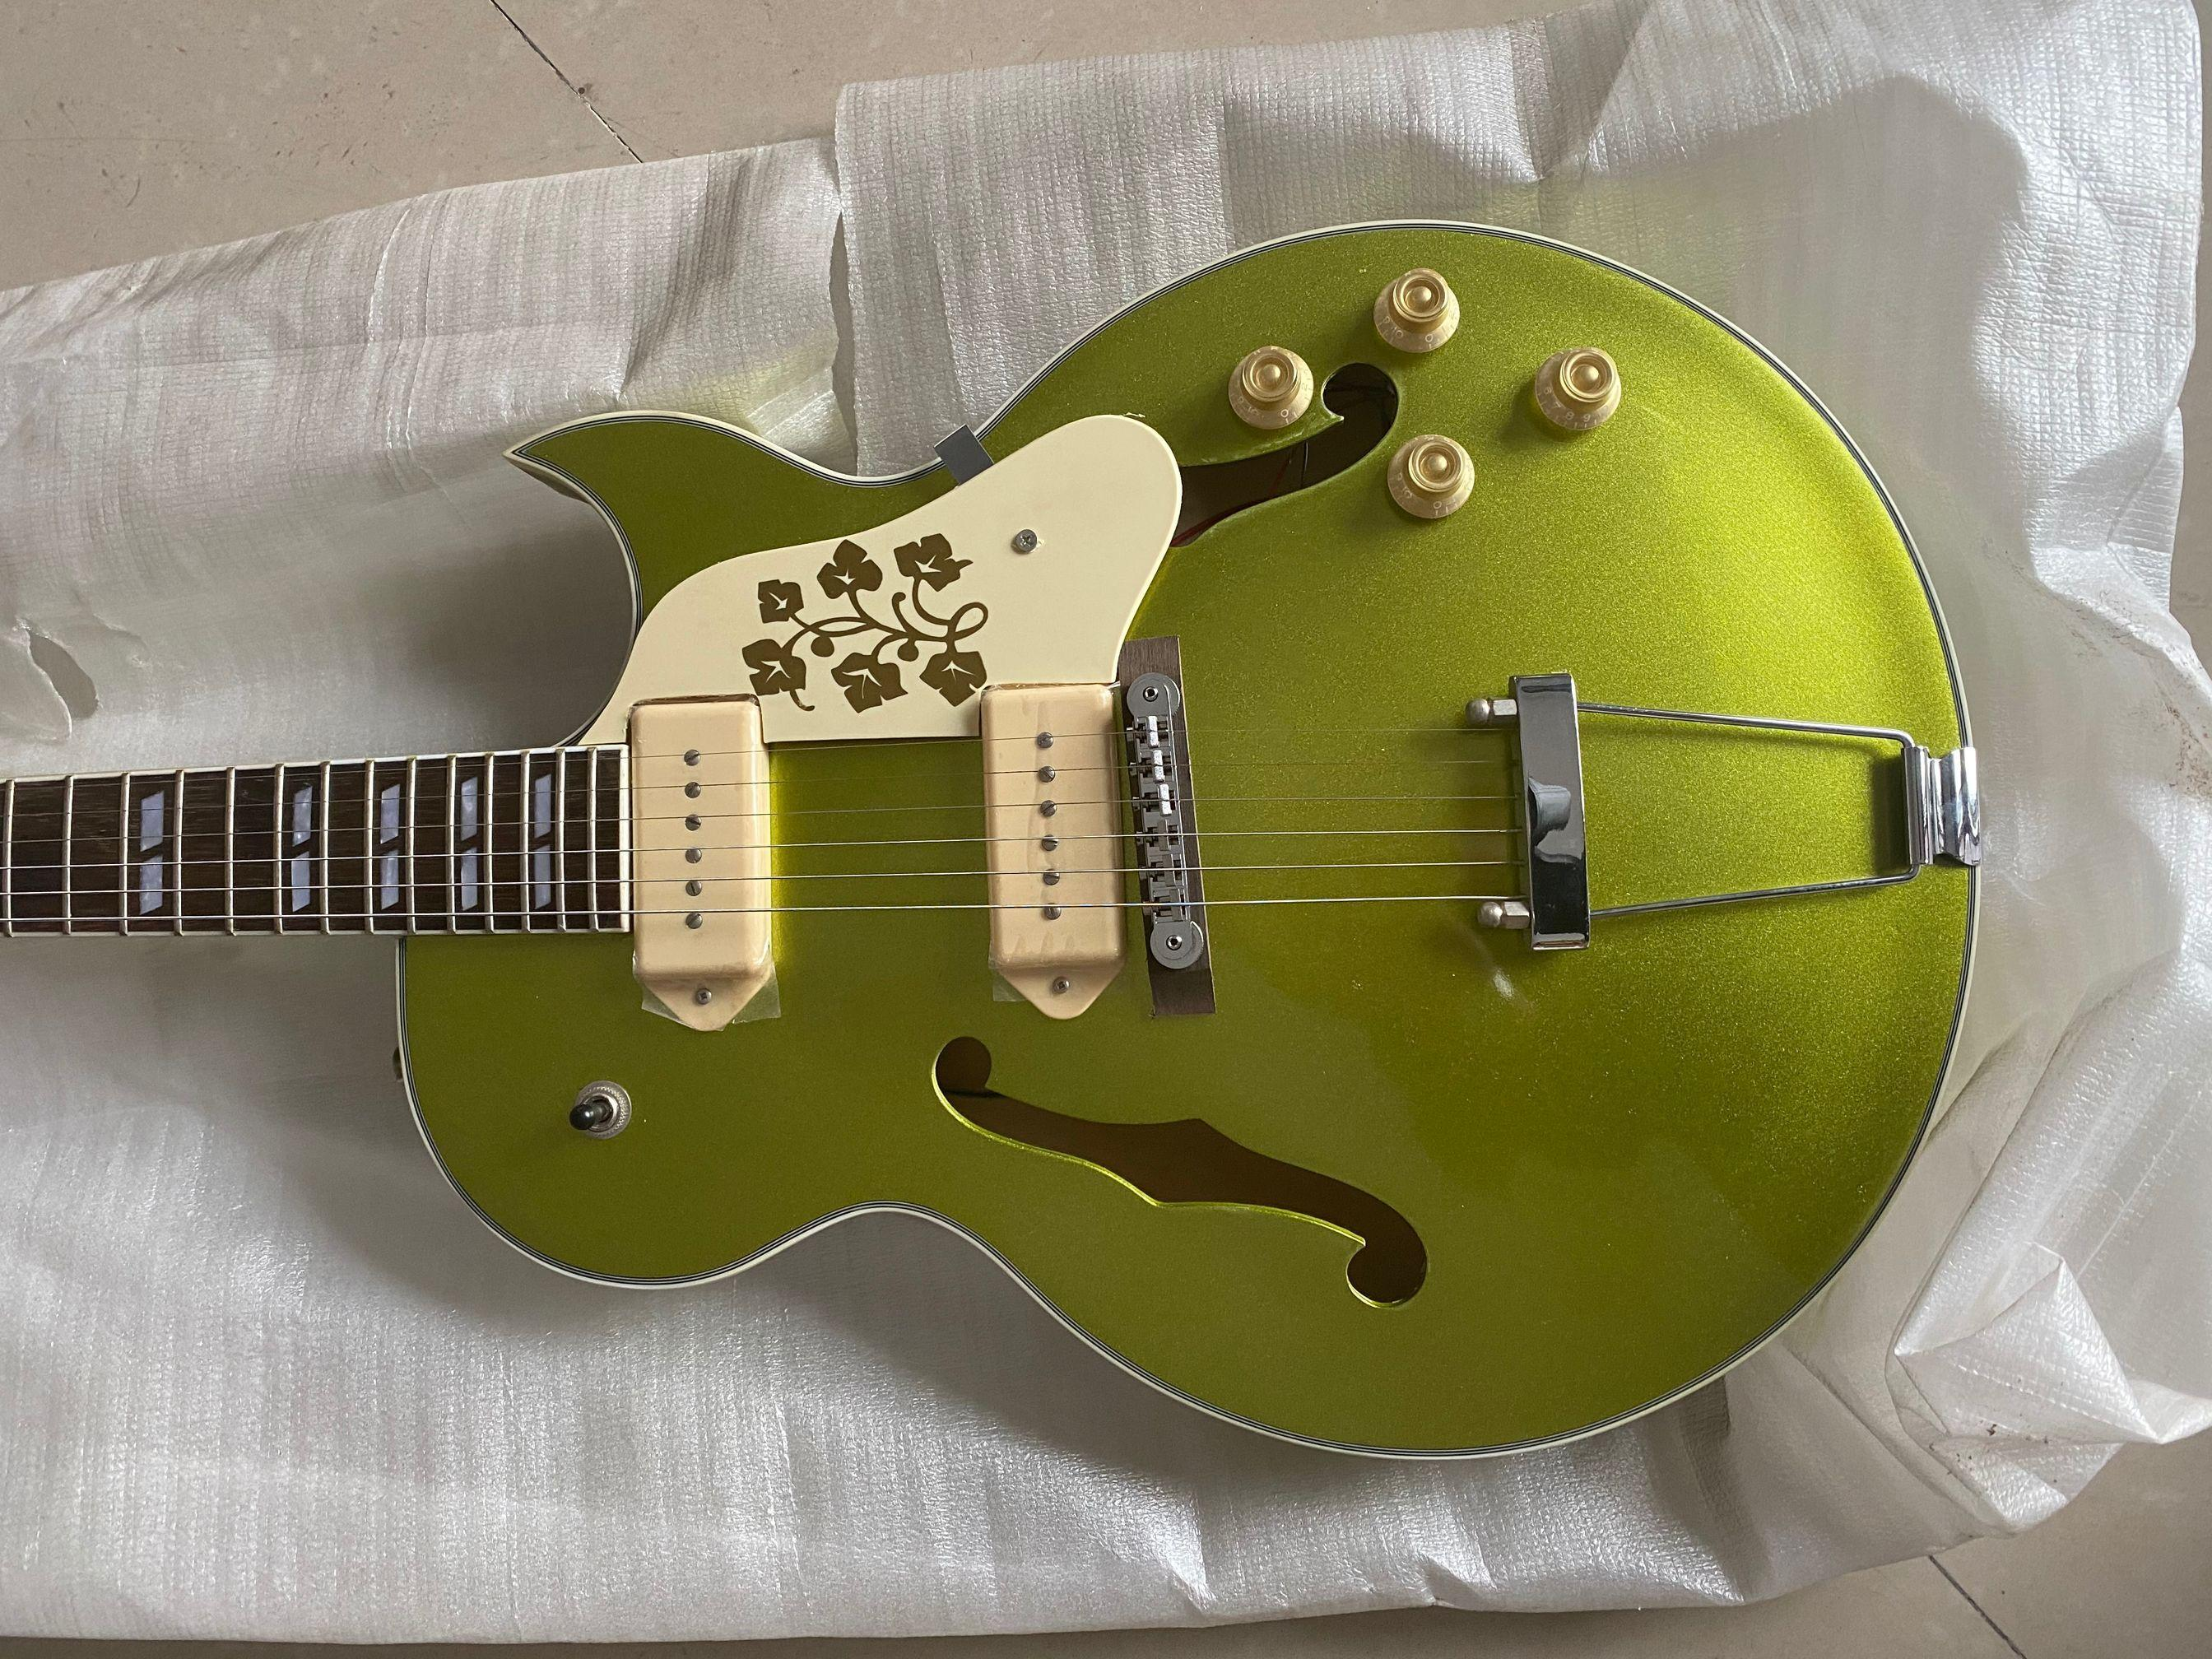 Custom Shop ES 295 Memphis Scotty Moore Metallic Green Gold Hollow Body E-Gitarren-Doppel F Holes, Weiß P90 Pickups, Trapeze Tailpiece